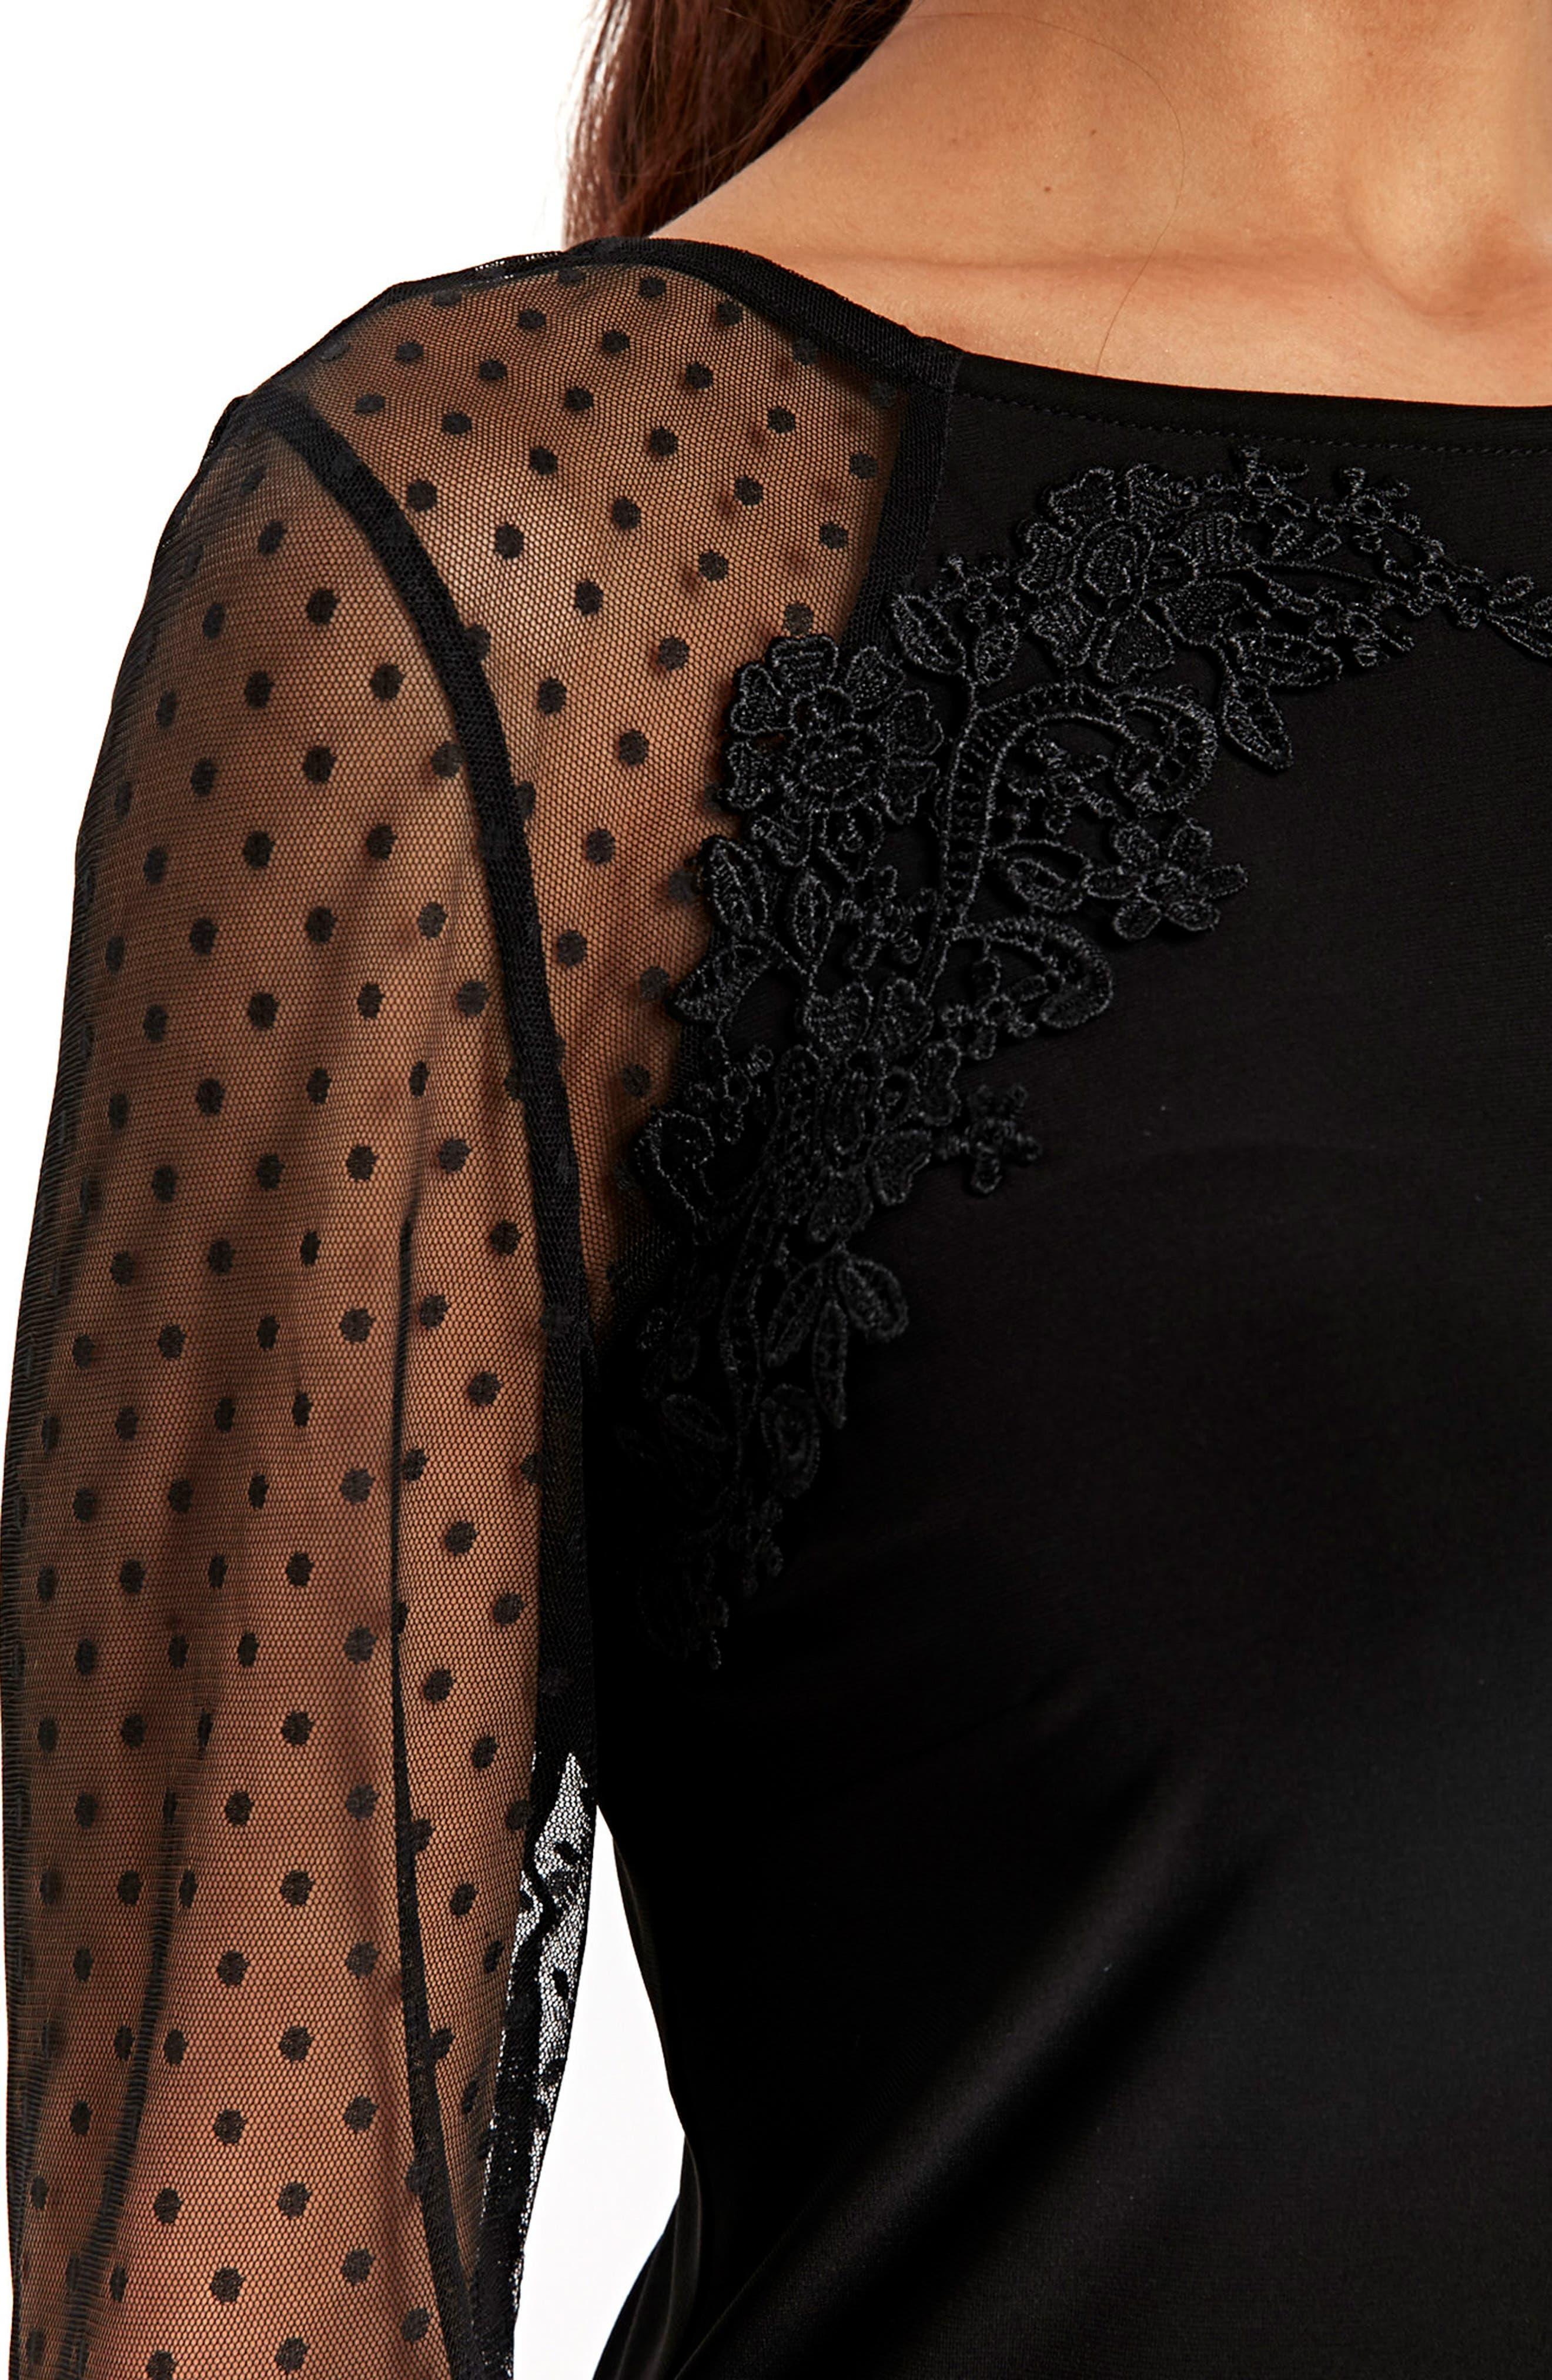 Dot Mesh Sleeve Sheath Dress,                             Alternate thumbnail 3, color,                             001